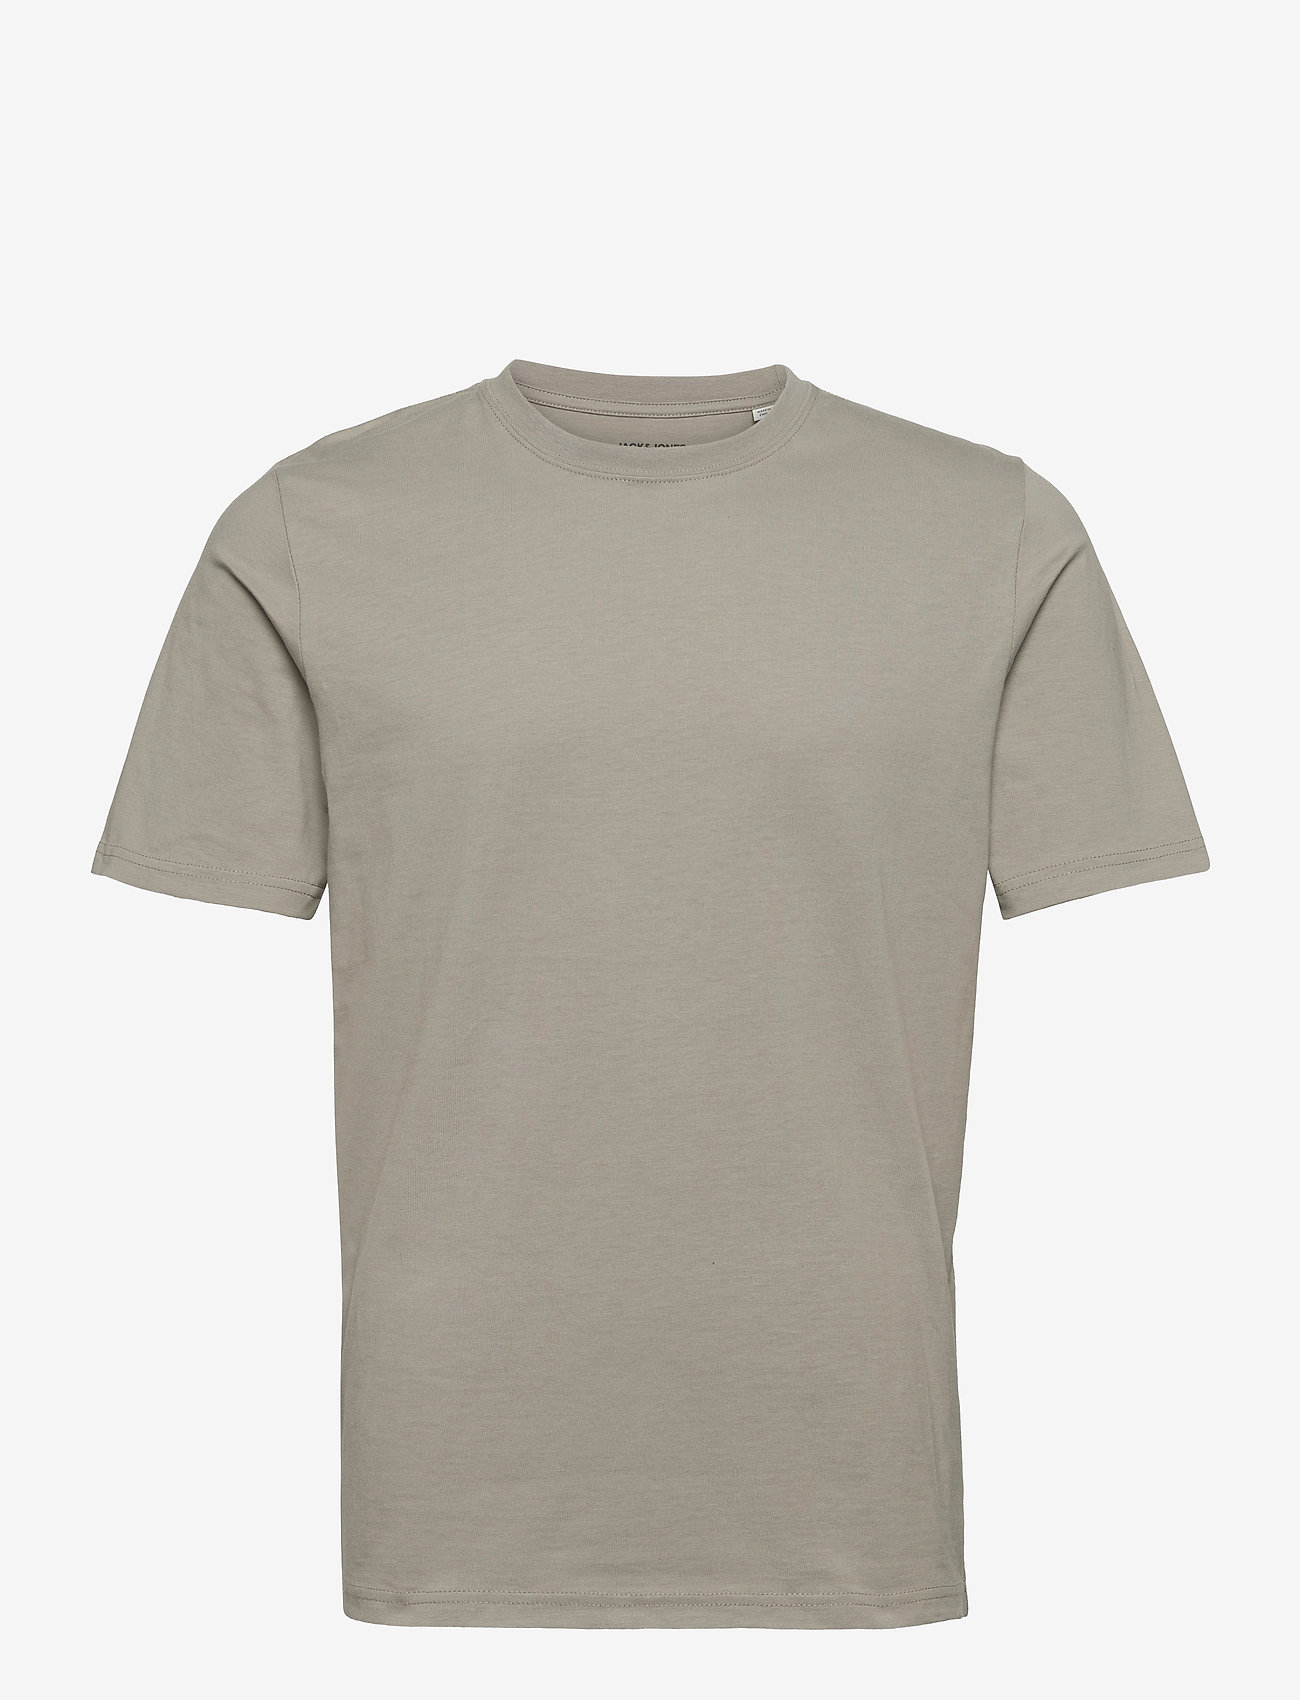 Jack & Jones - JPRBLAWAYN TEE SS CREW NECK - basic t-shirts - elephant skin - 0